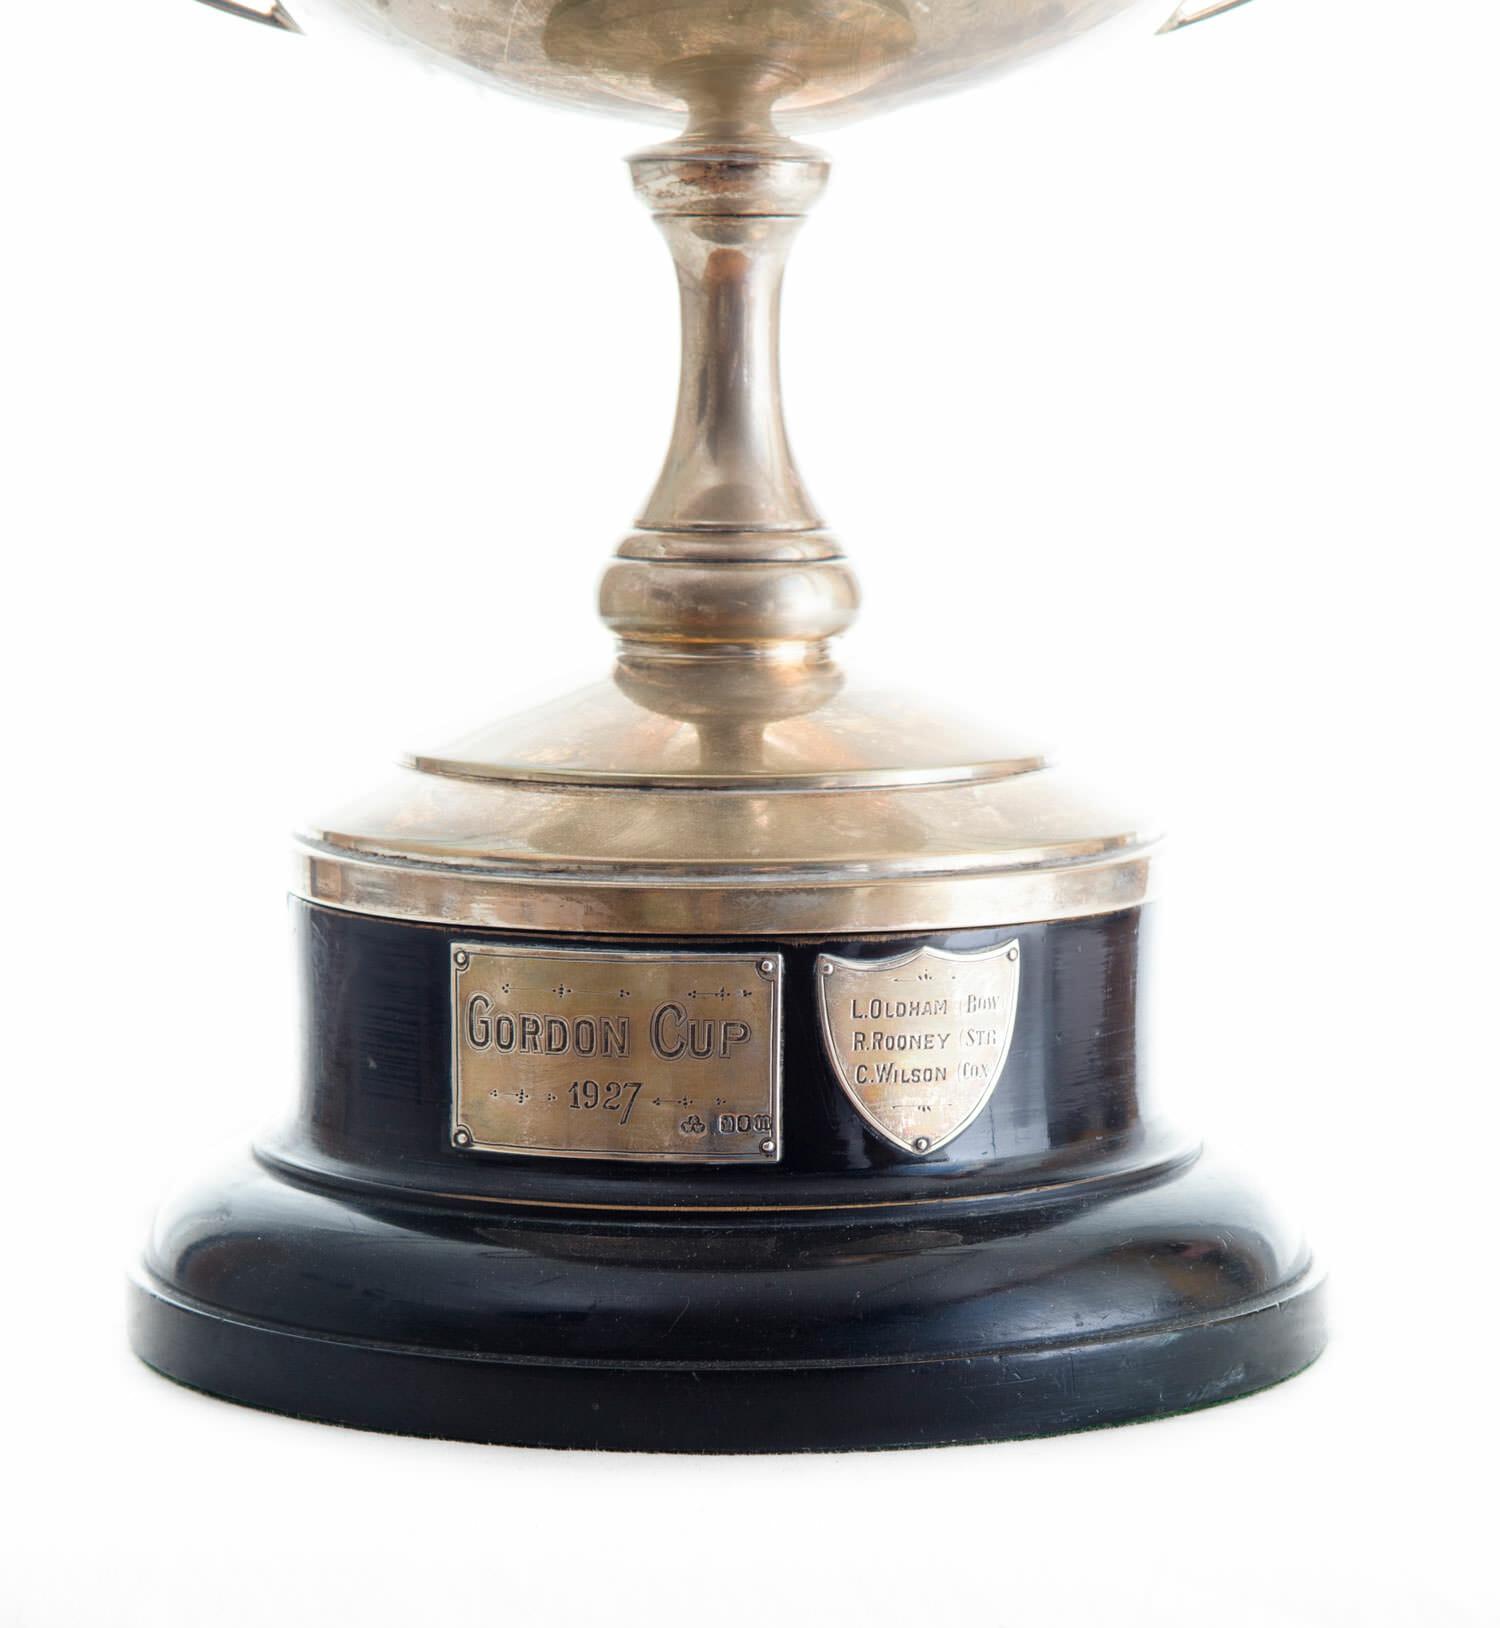 Gordon Cup